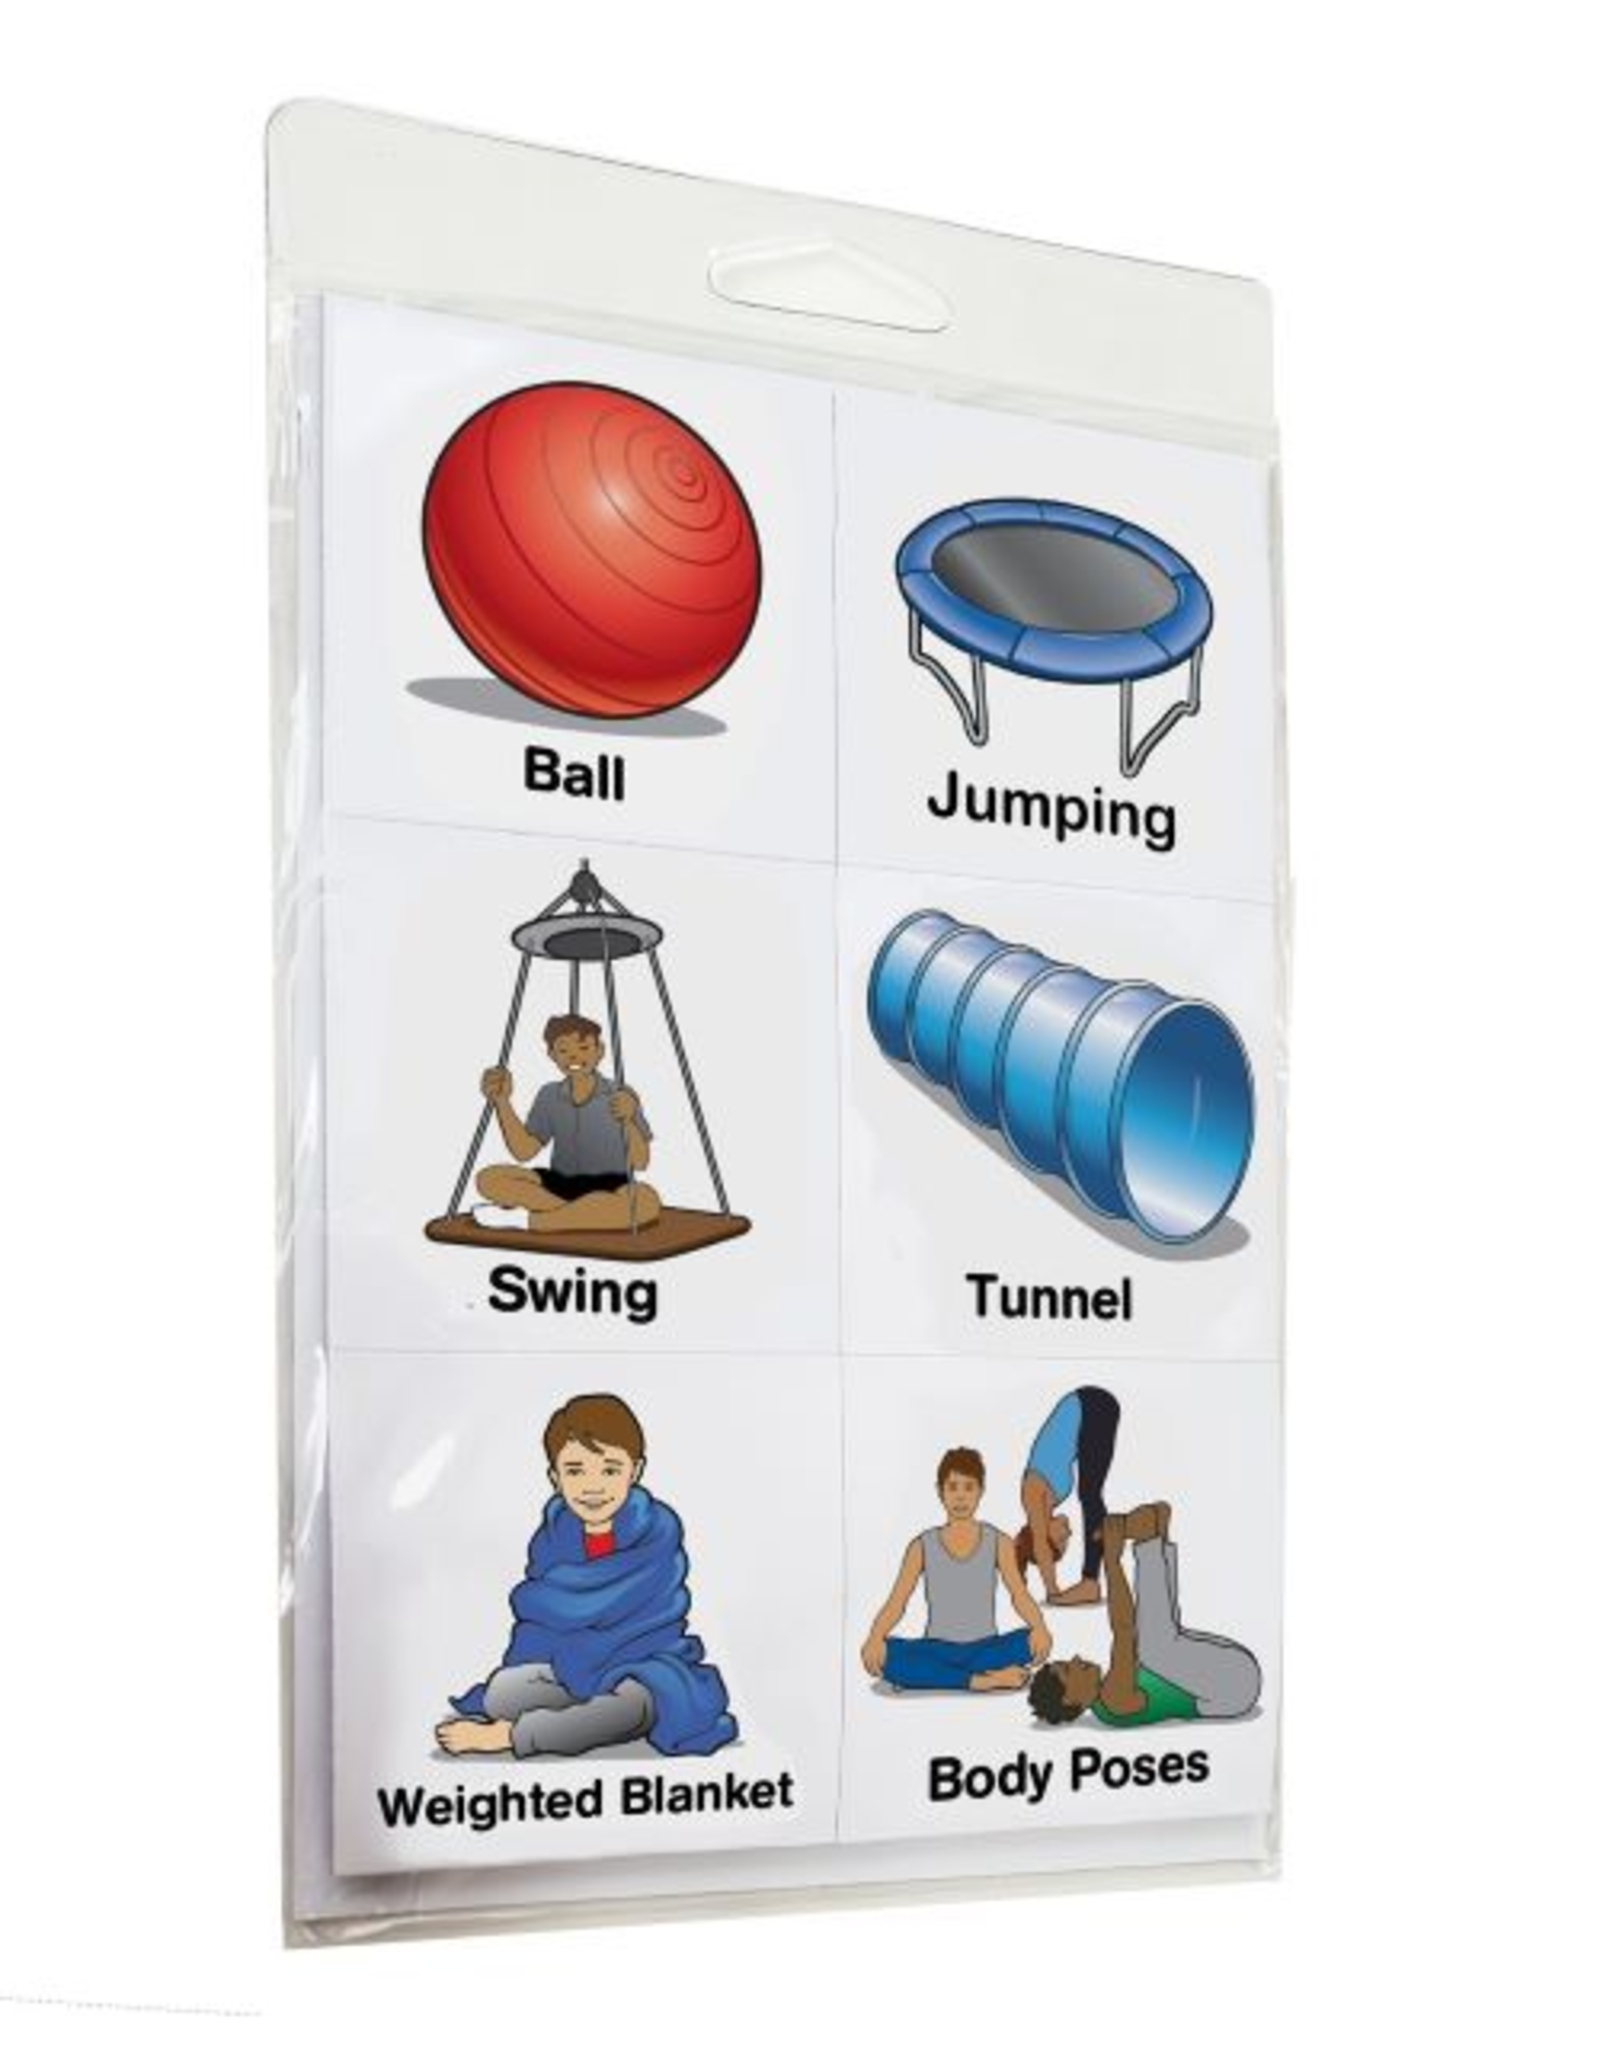 Schkidules Sensory Expansion Pack